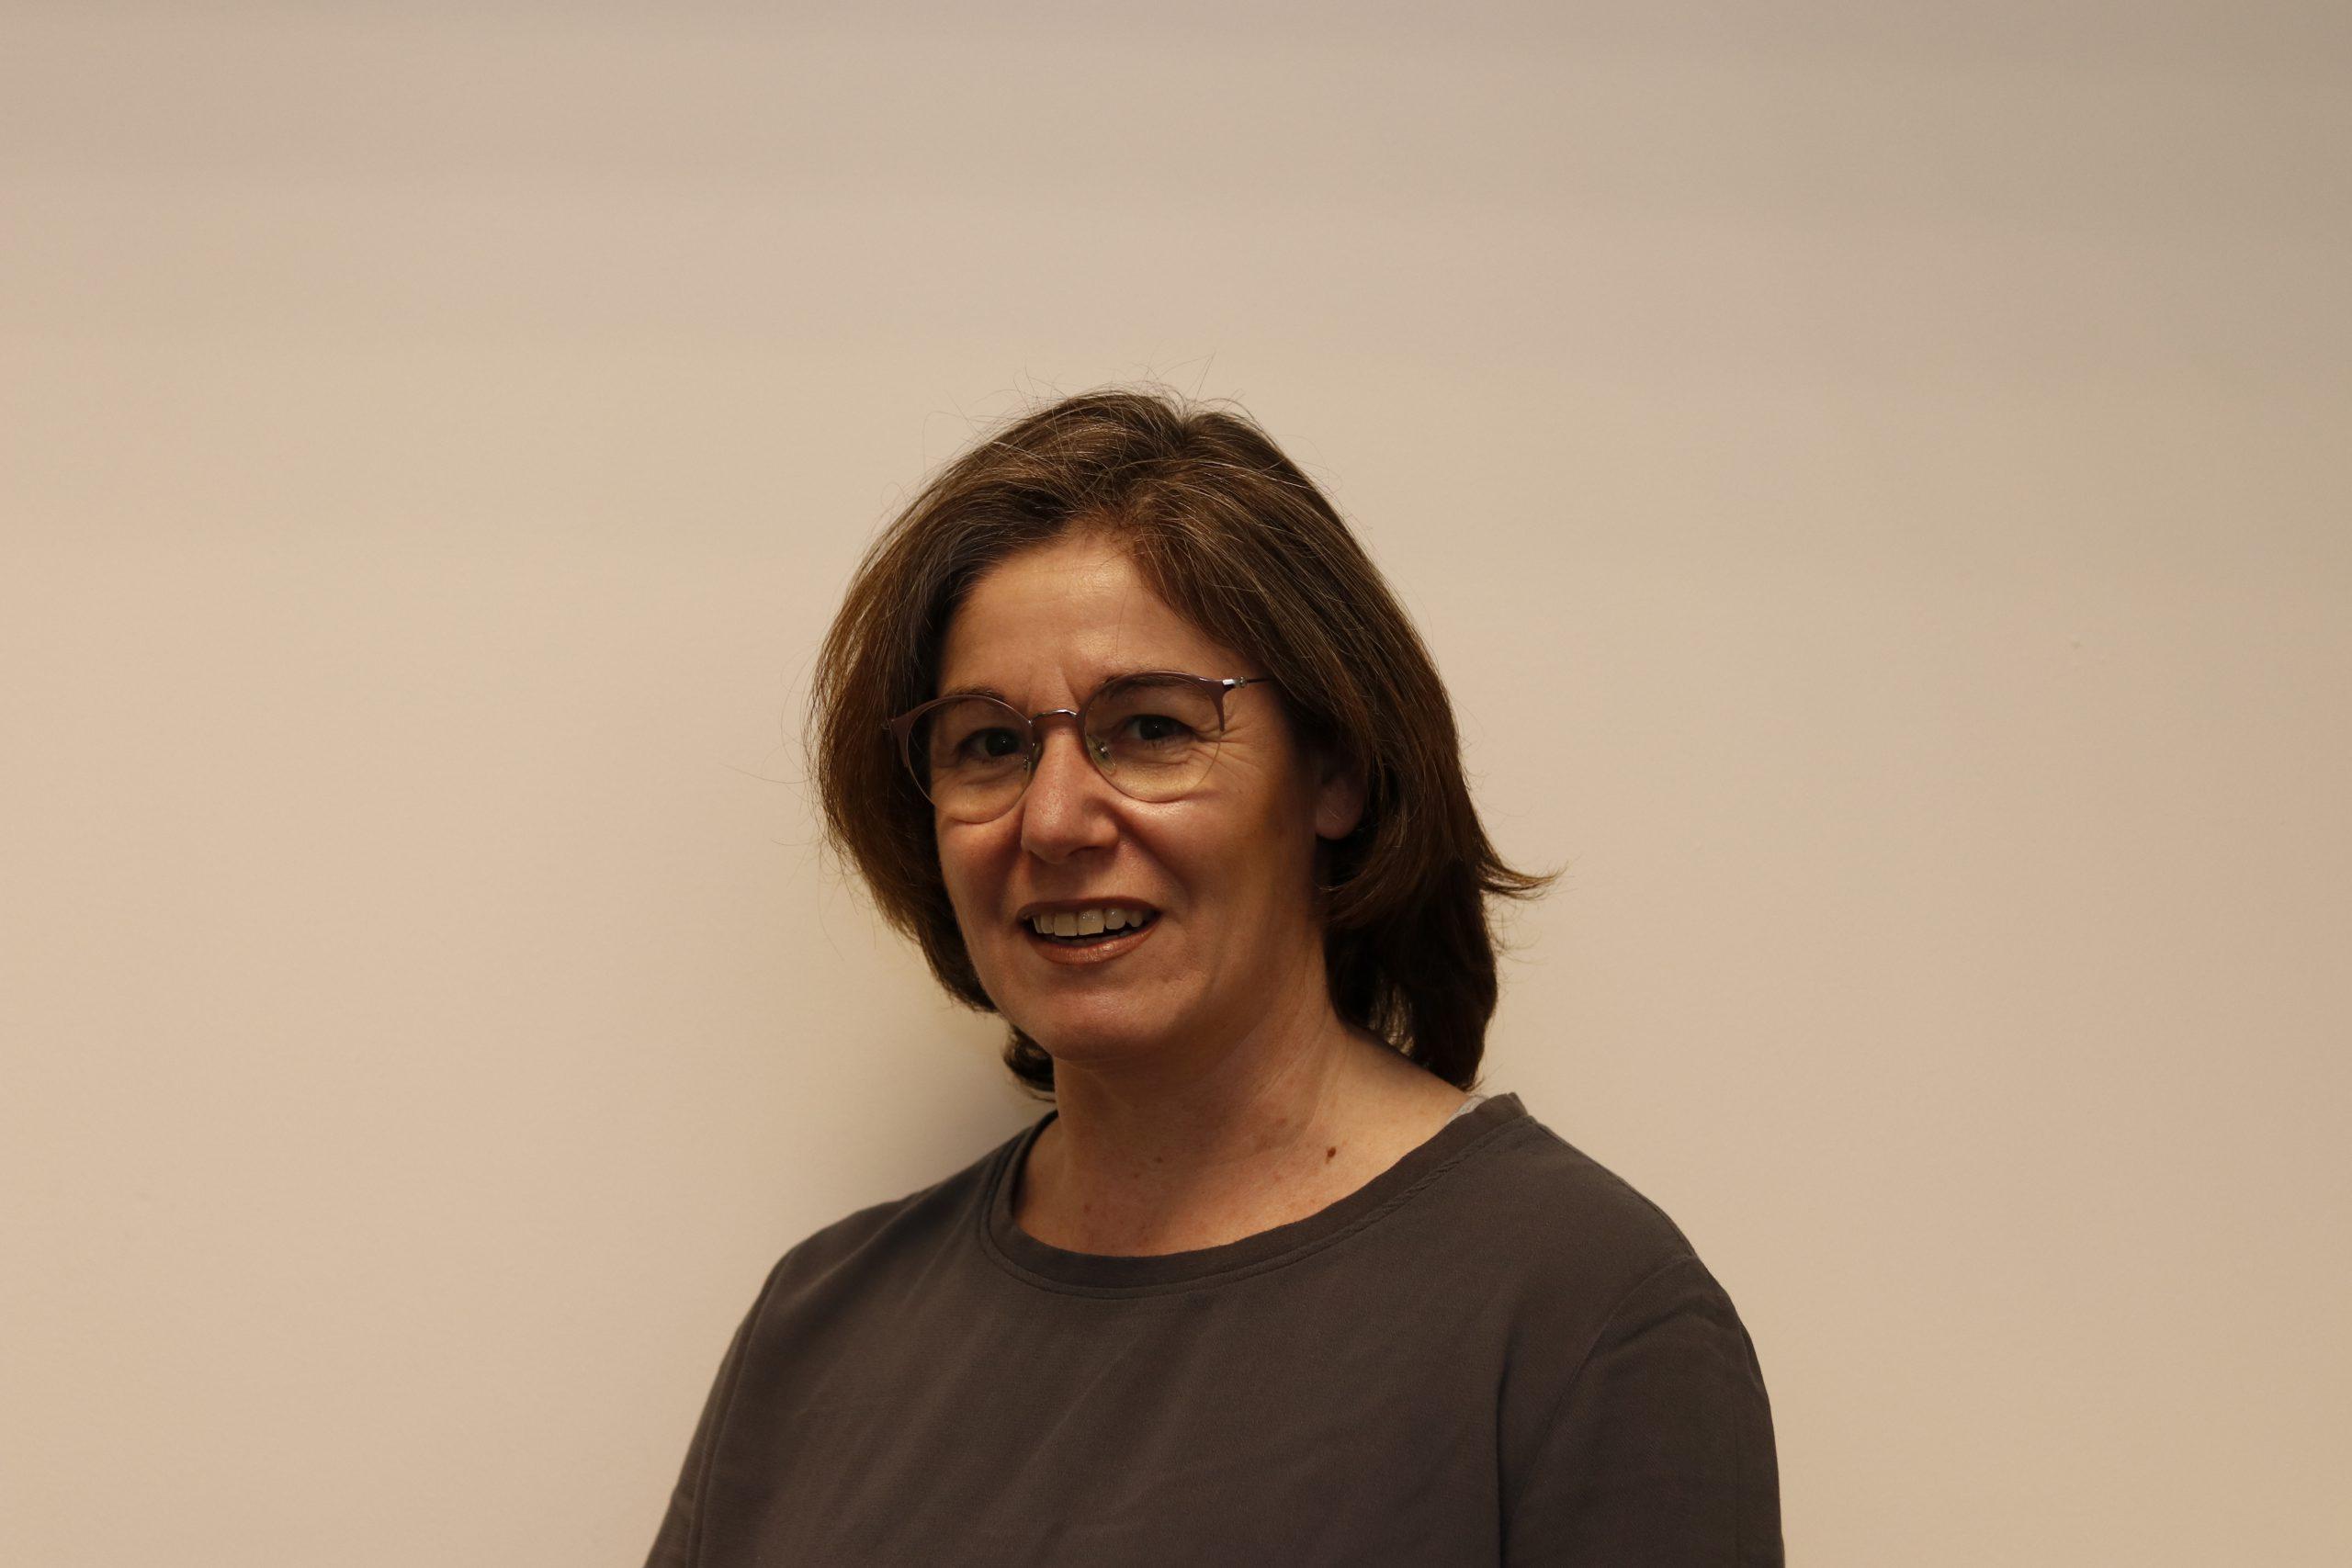 Heidi Huysmans